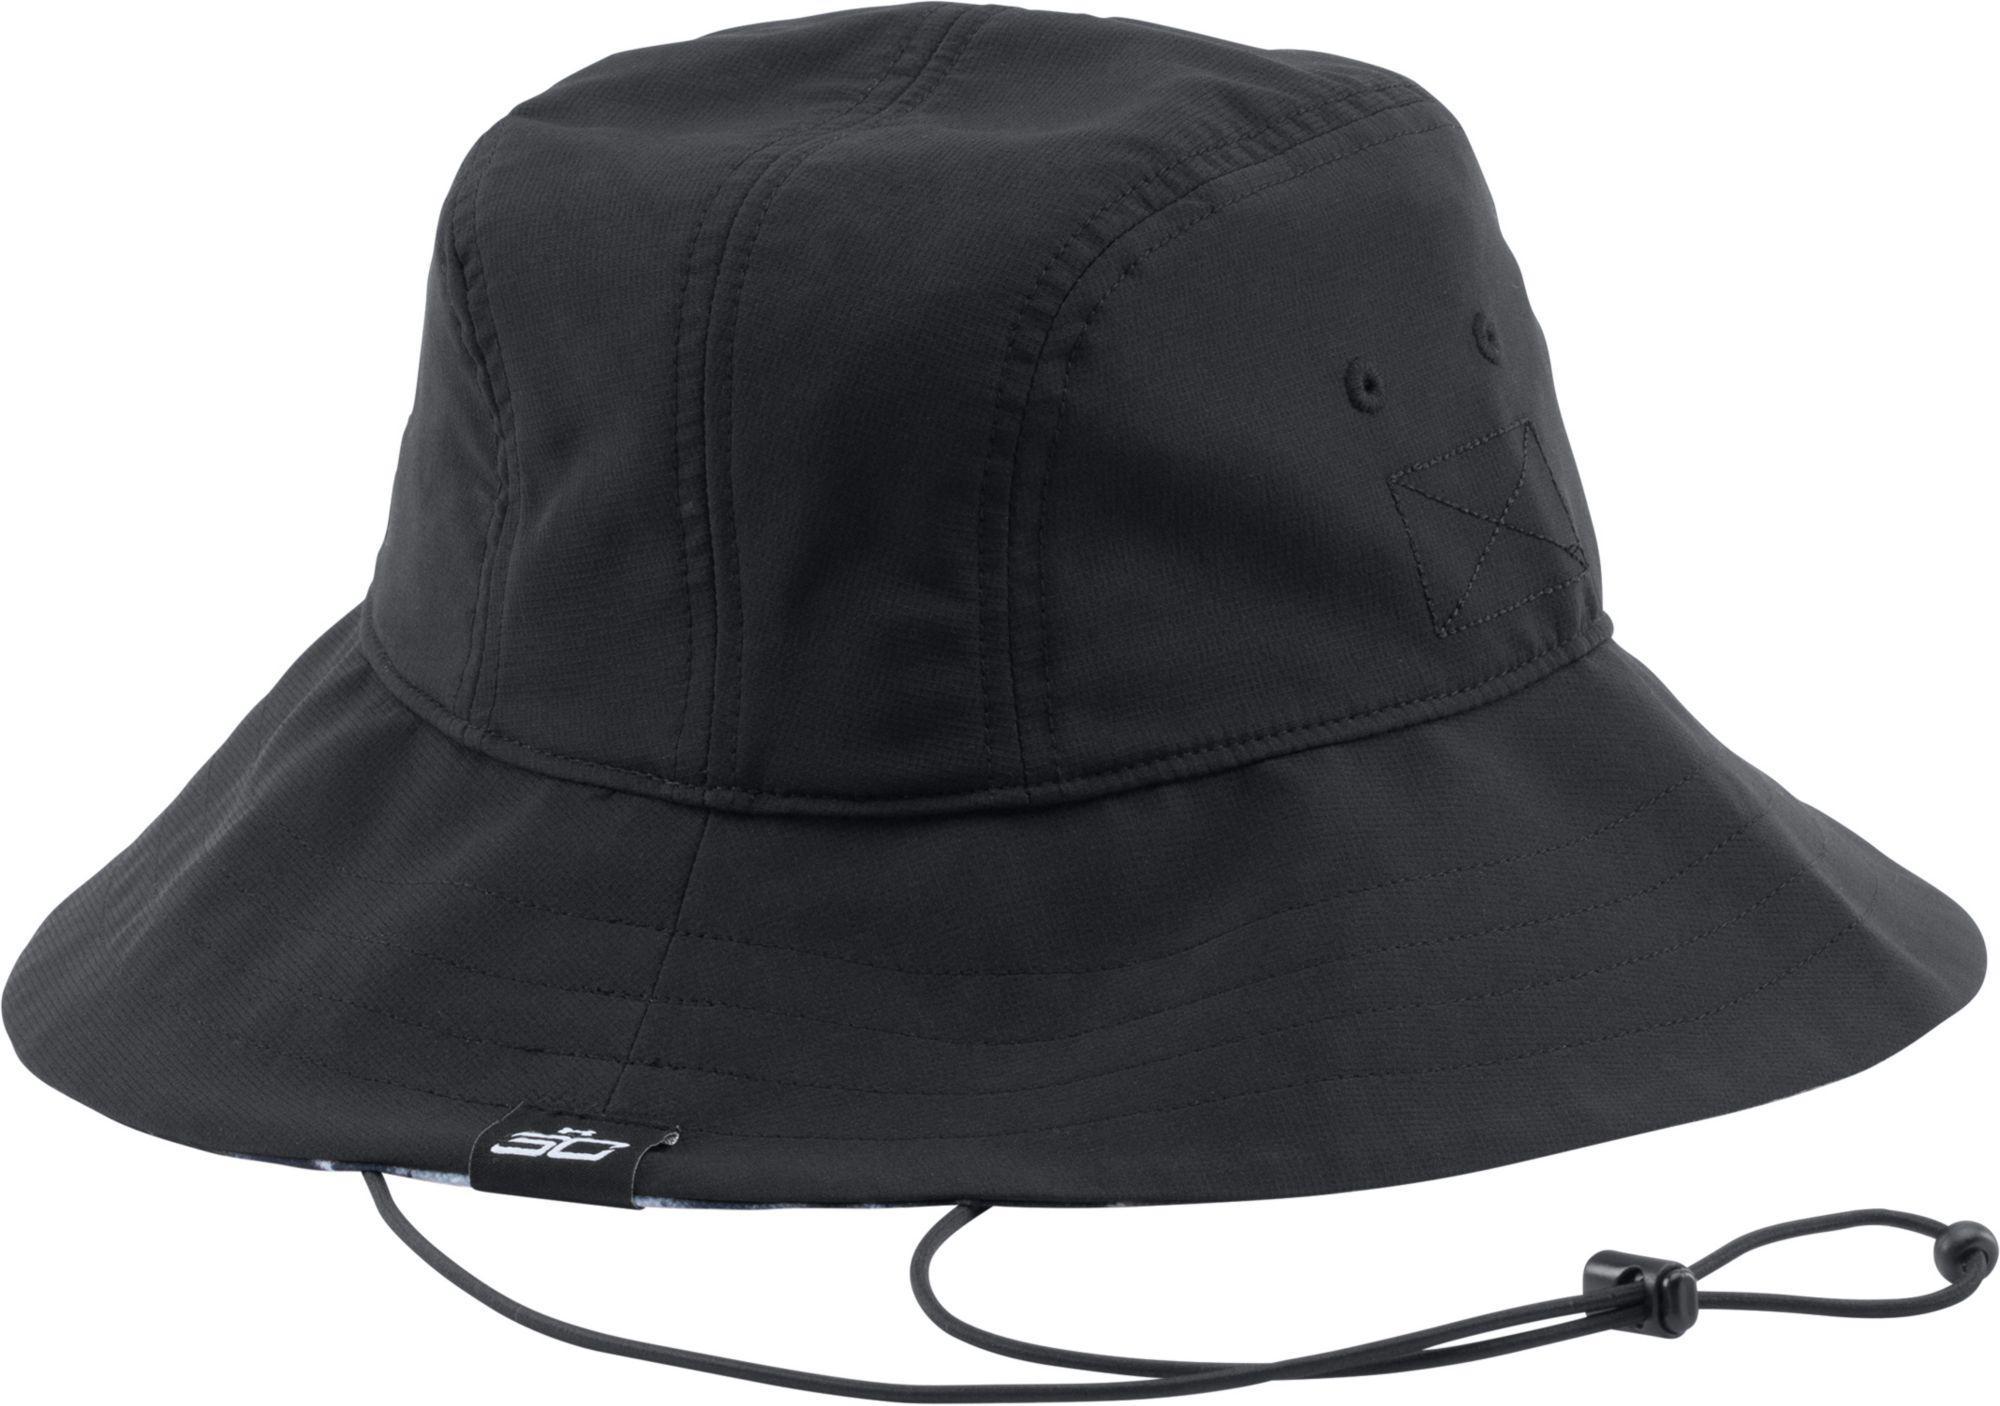 6cc8659d595de Lyst - Under Armour Sc30 Basketball Bucket Hat in Black for Men